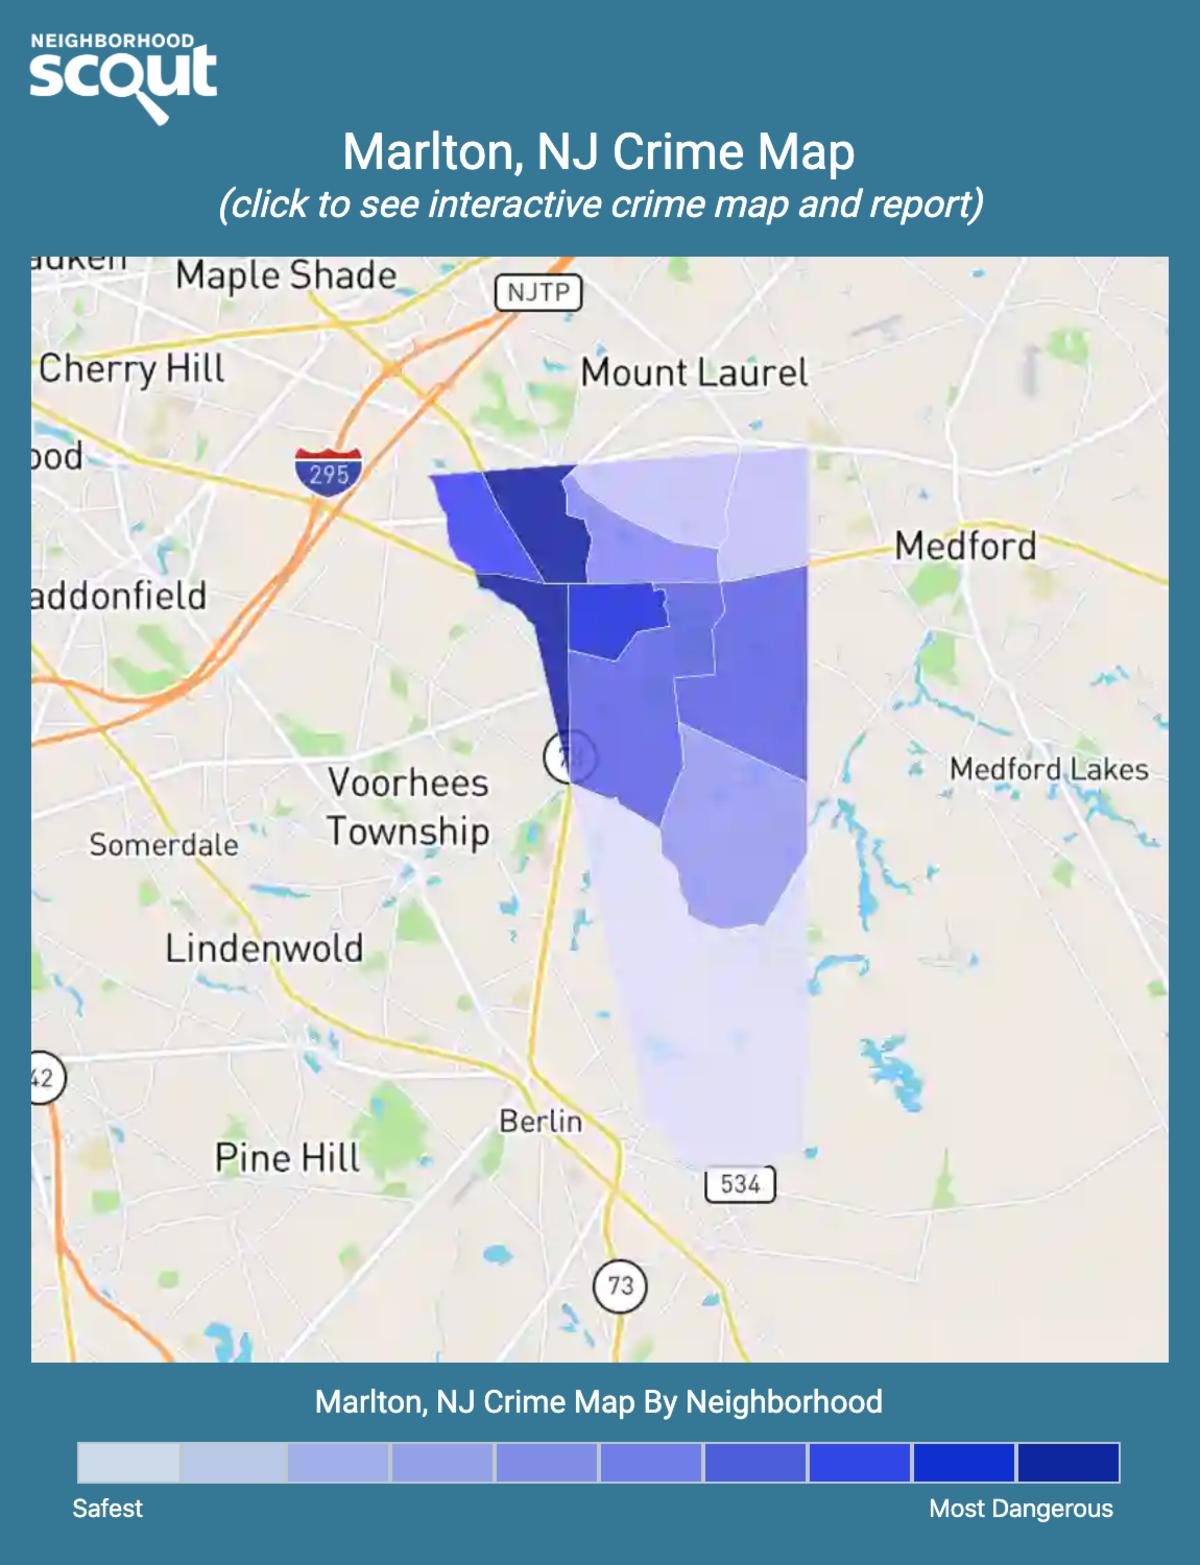 Marlton, New Jersey crime map